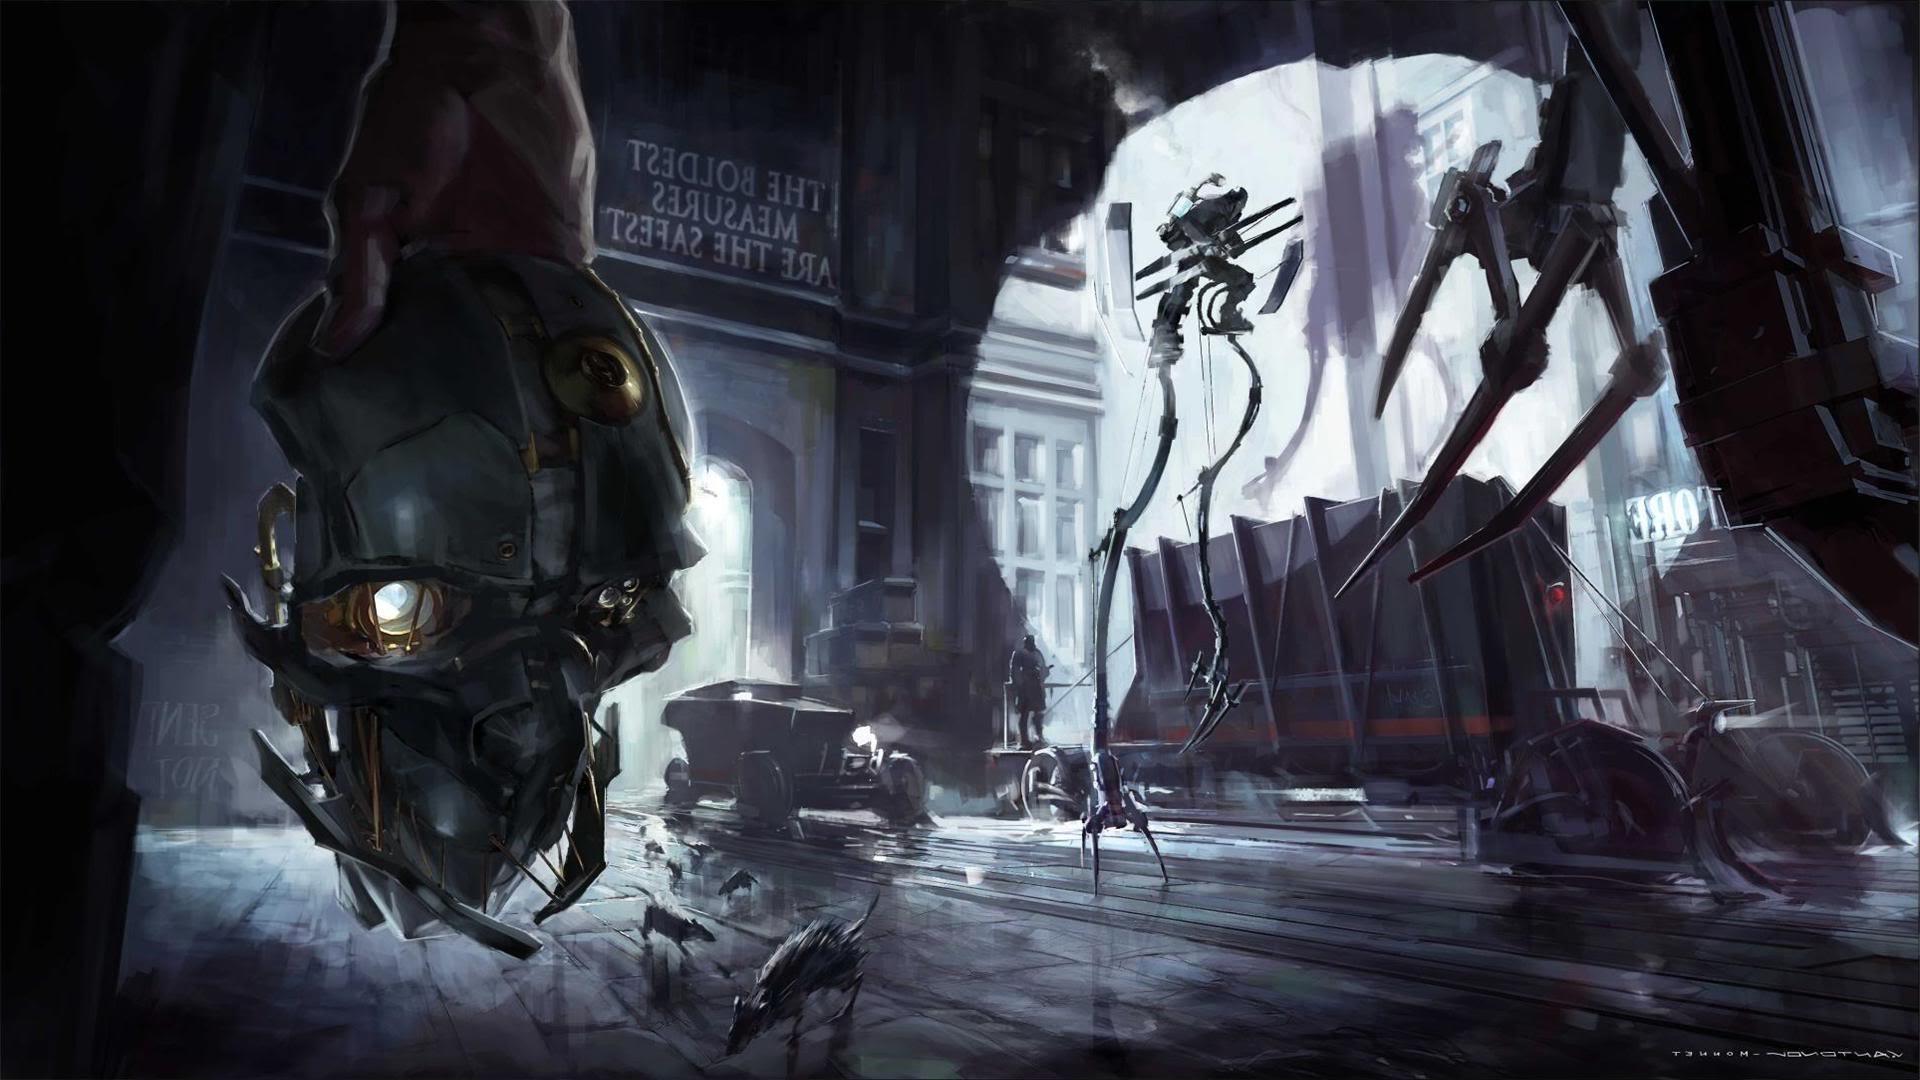 wallpaper : video games, artwork, dishonored, darkness, screenshot